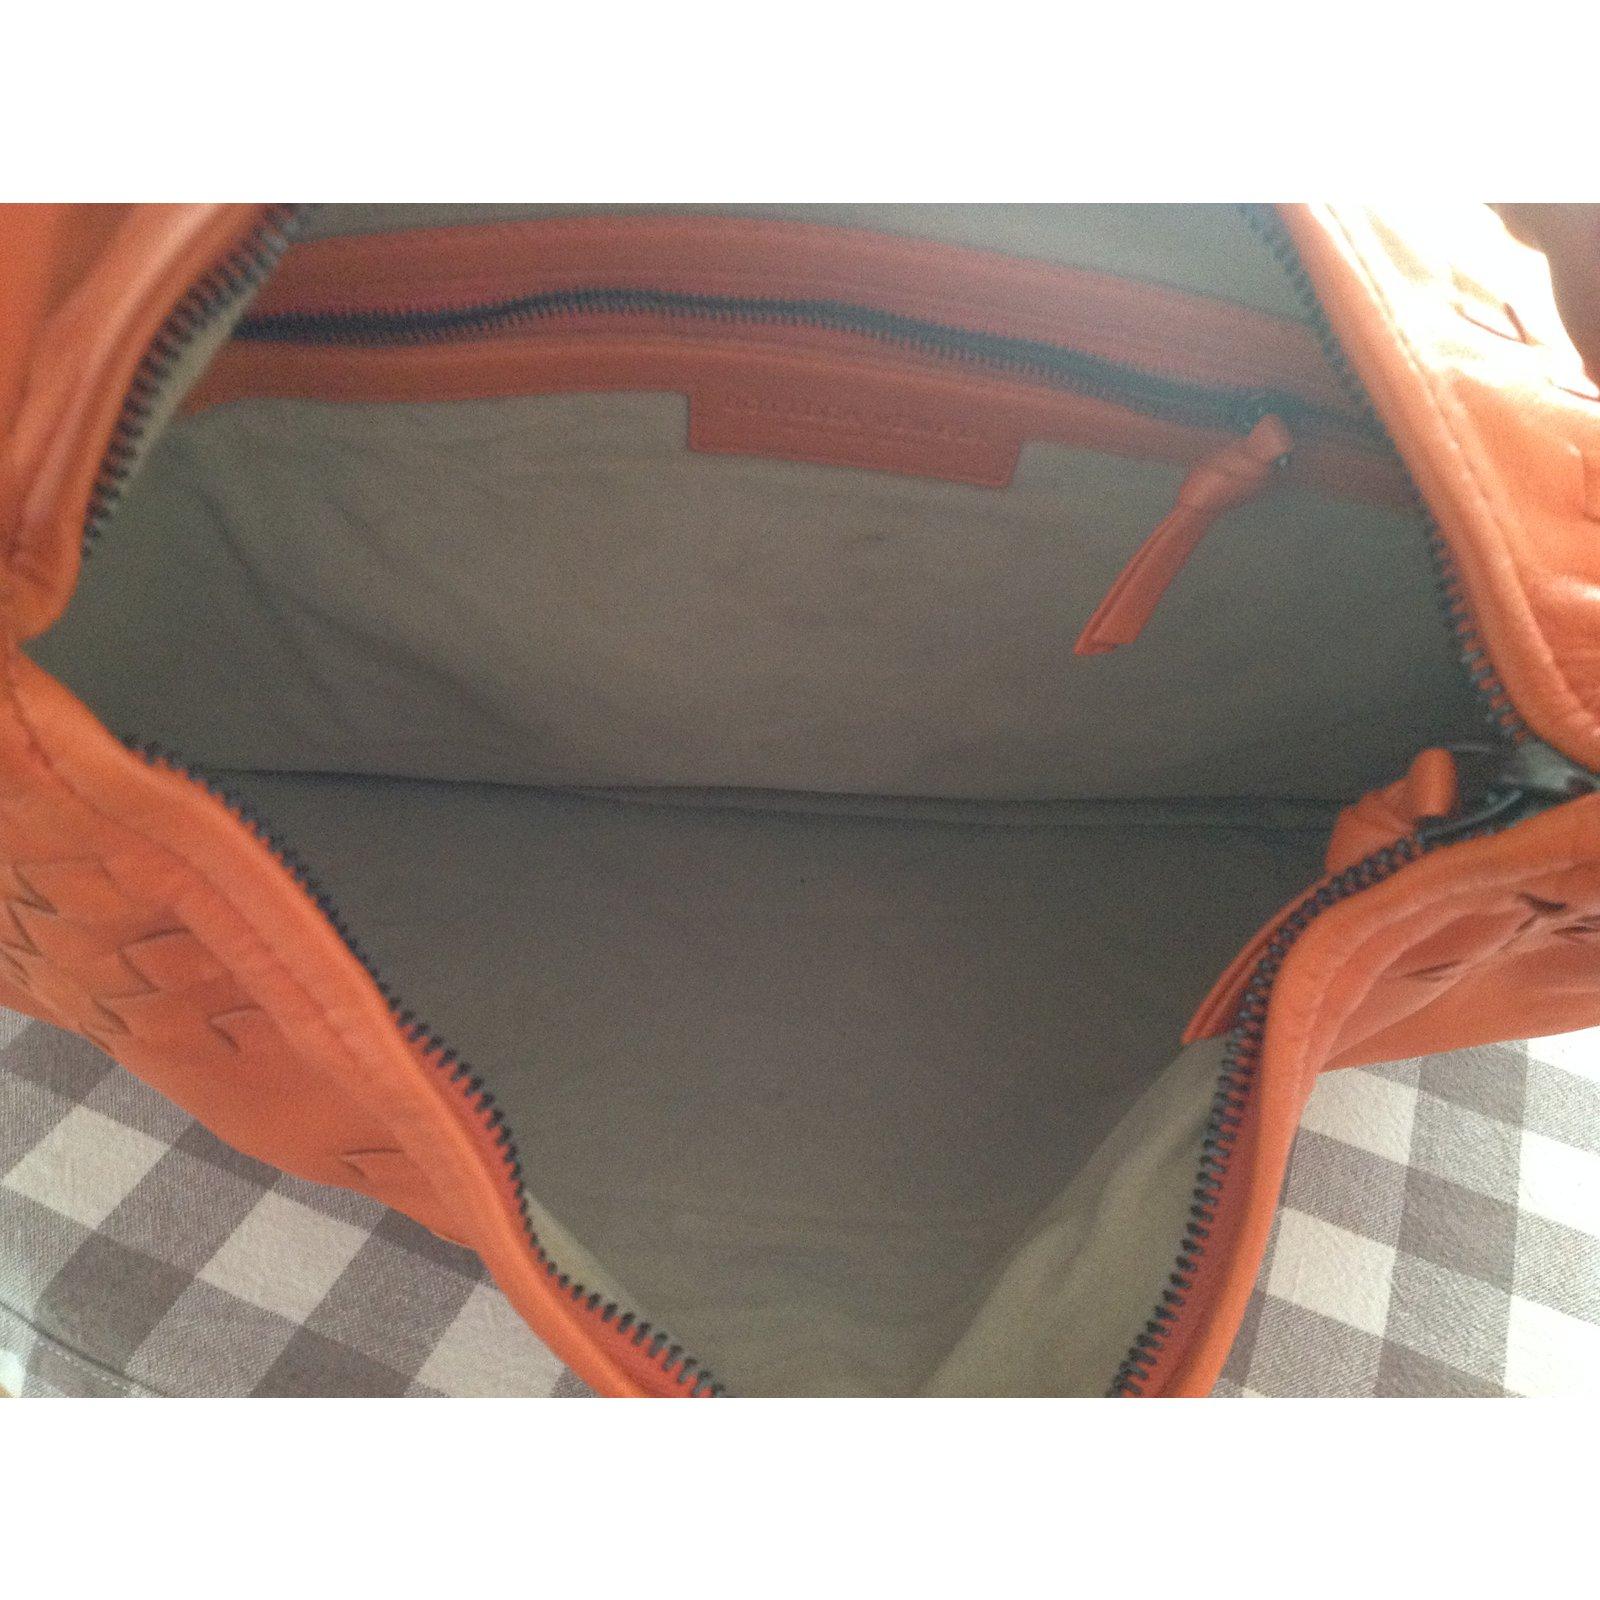 581a4d1e10 ... Women s bags Bottega Veneta · Handbags Bottega Veneta · Facebook · Pin  This